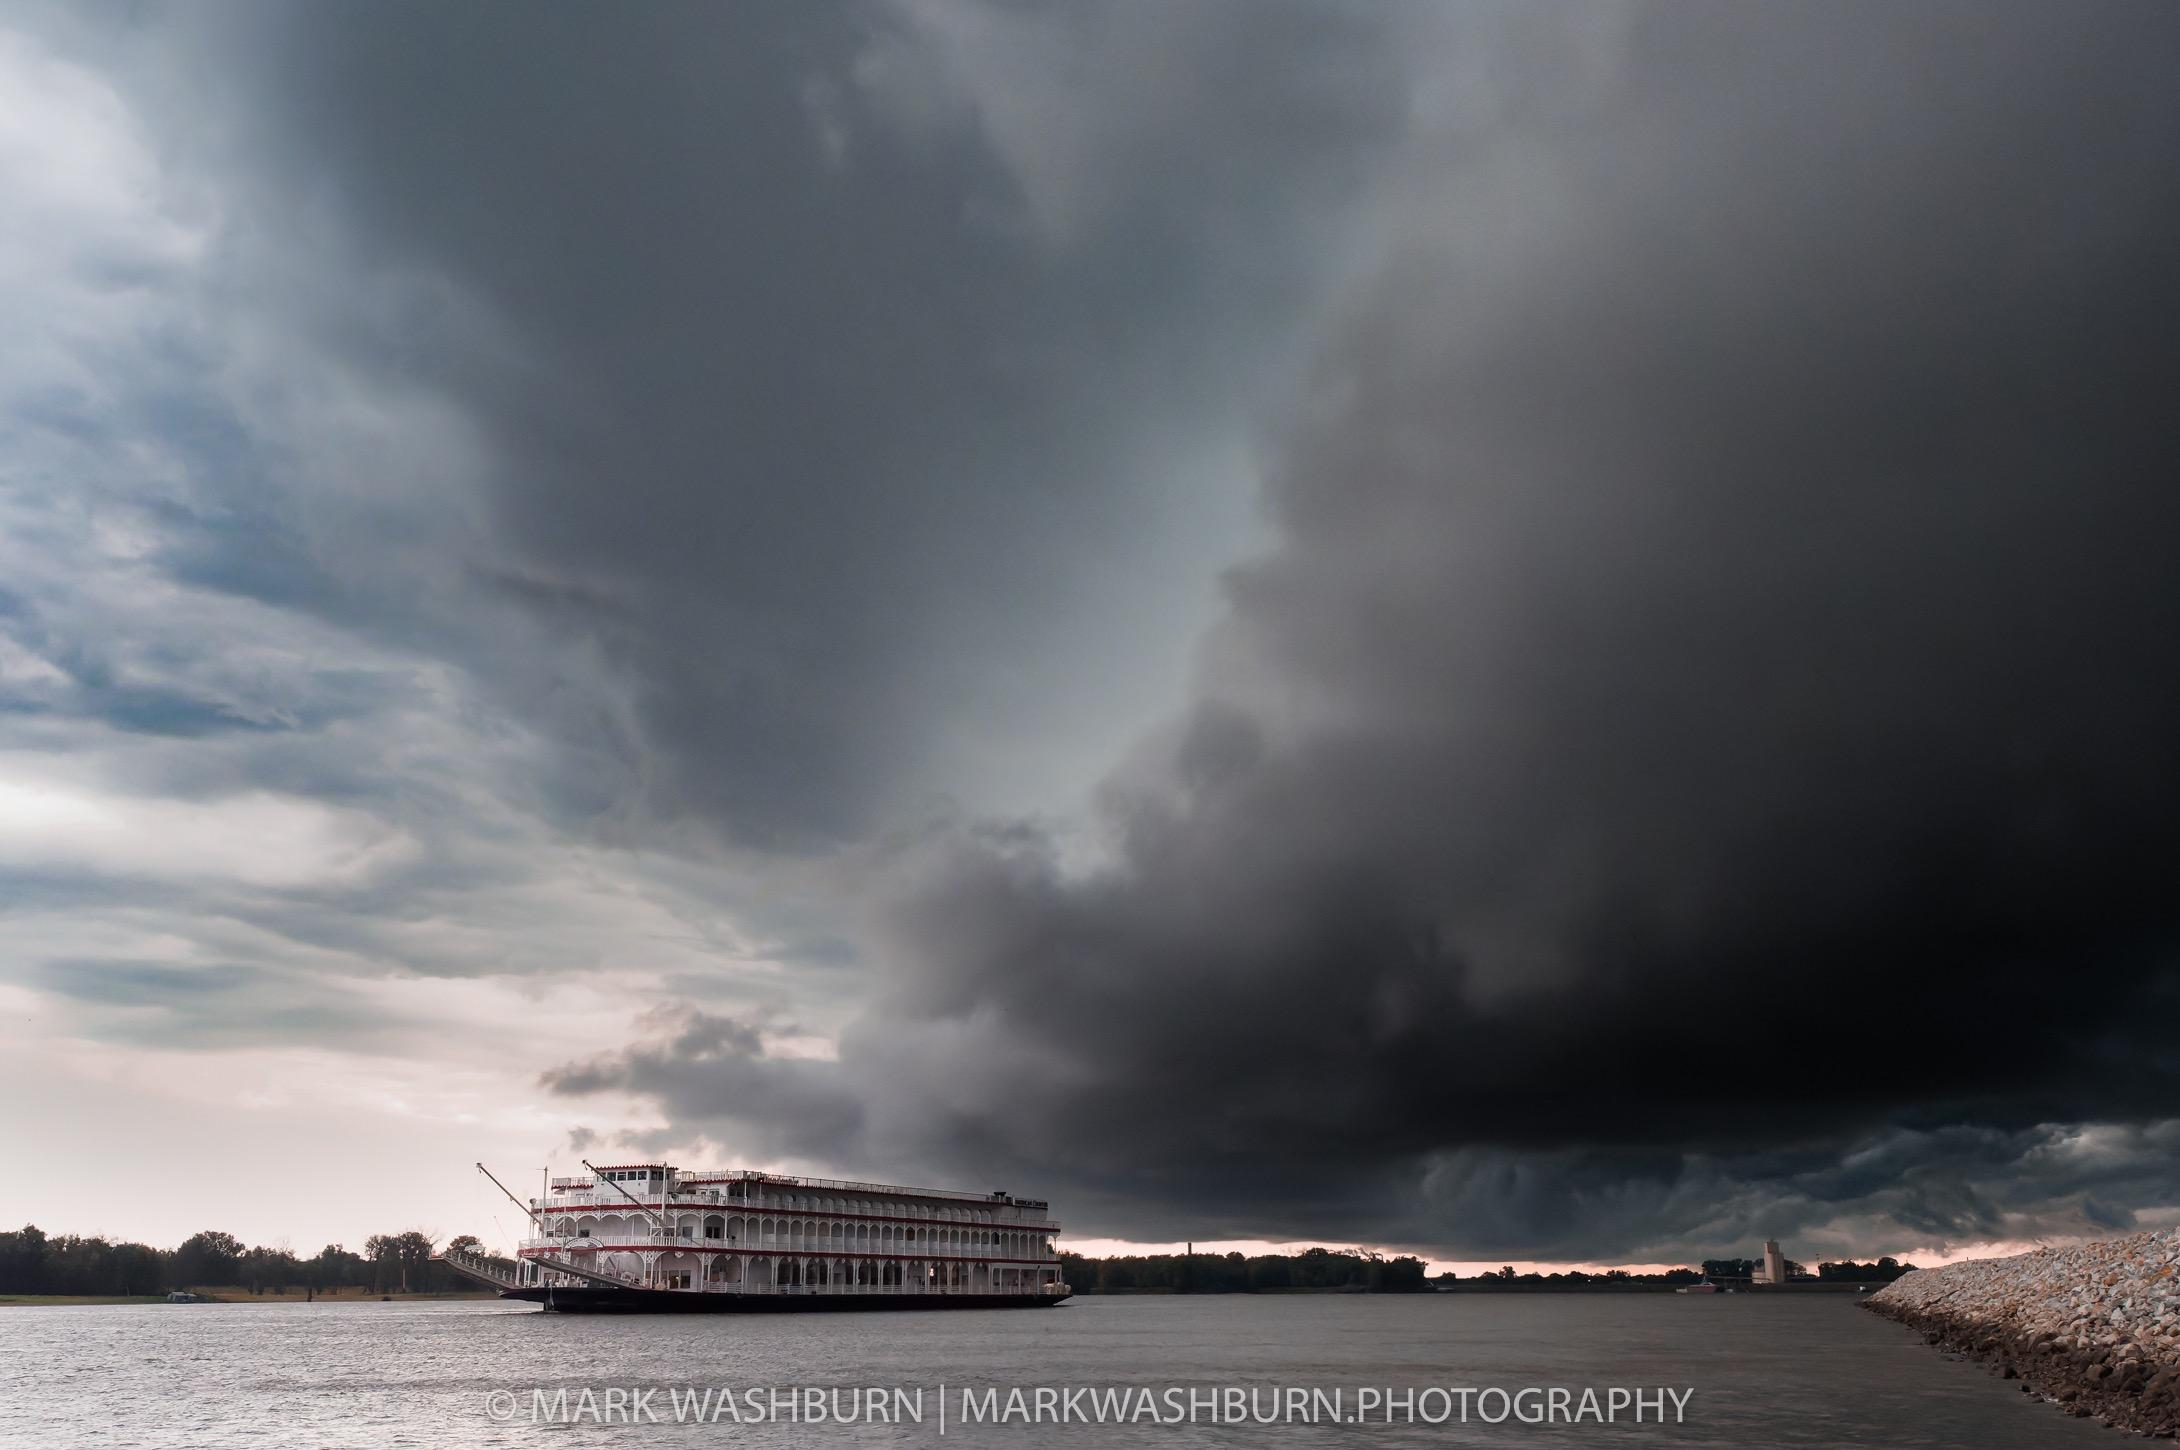 American countess storm 6